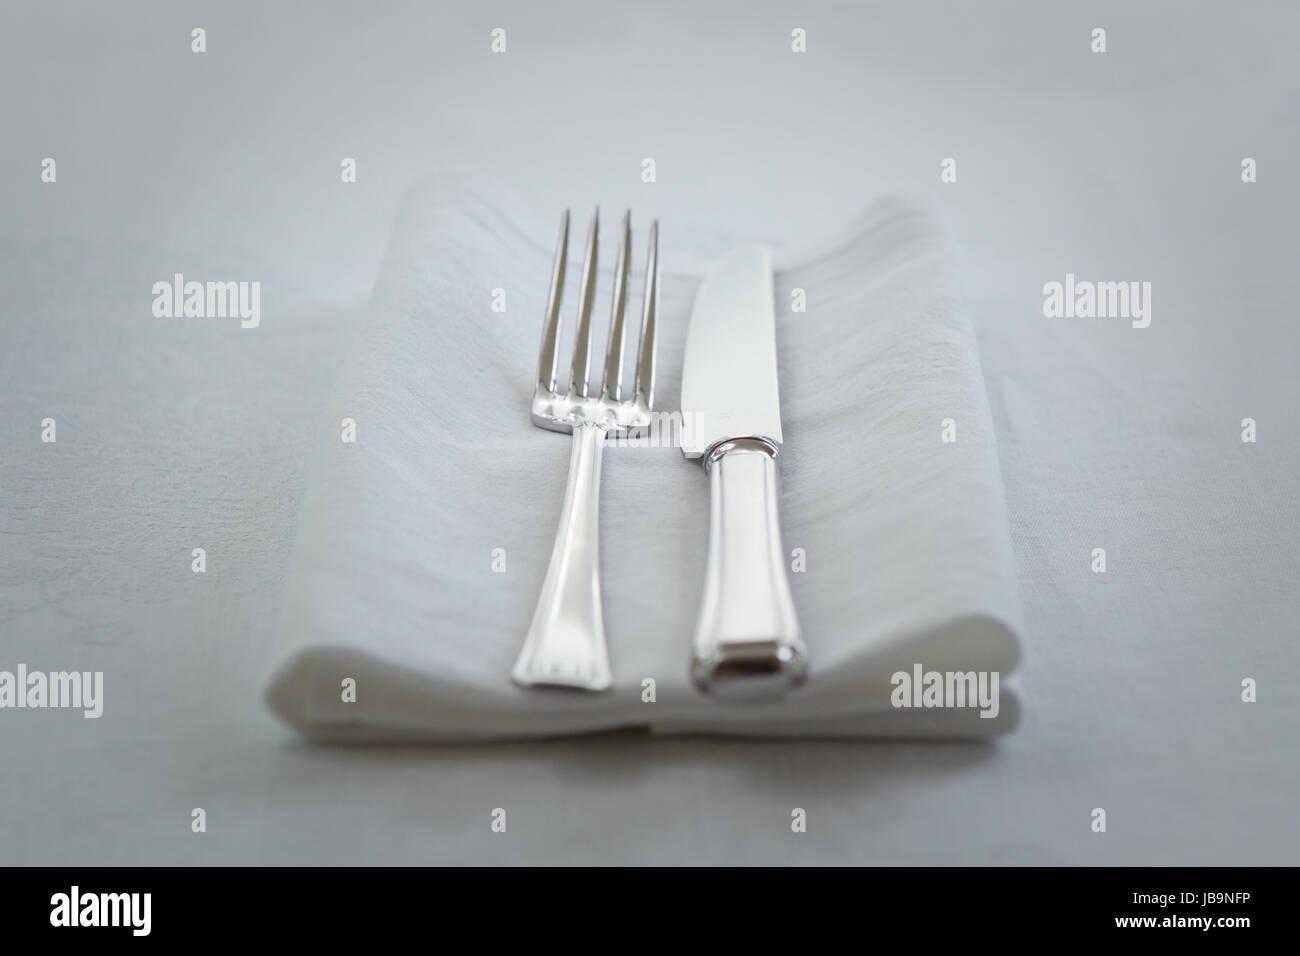 knife and fork on white napkin - Stock Image